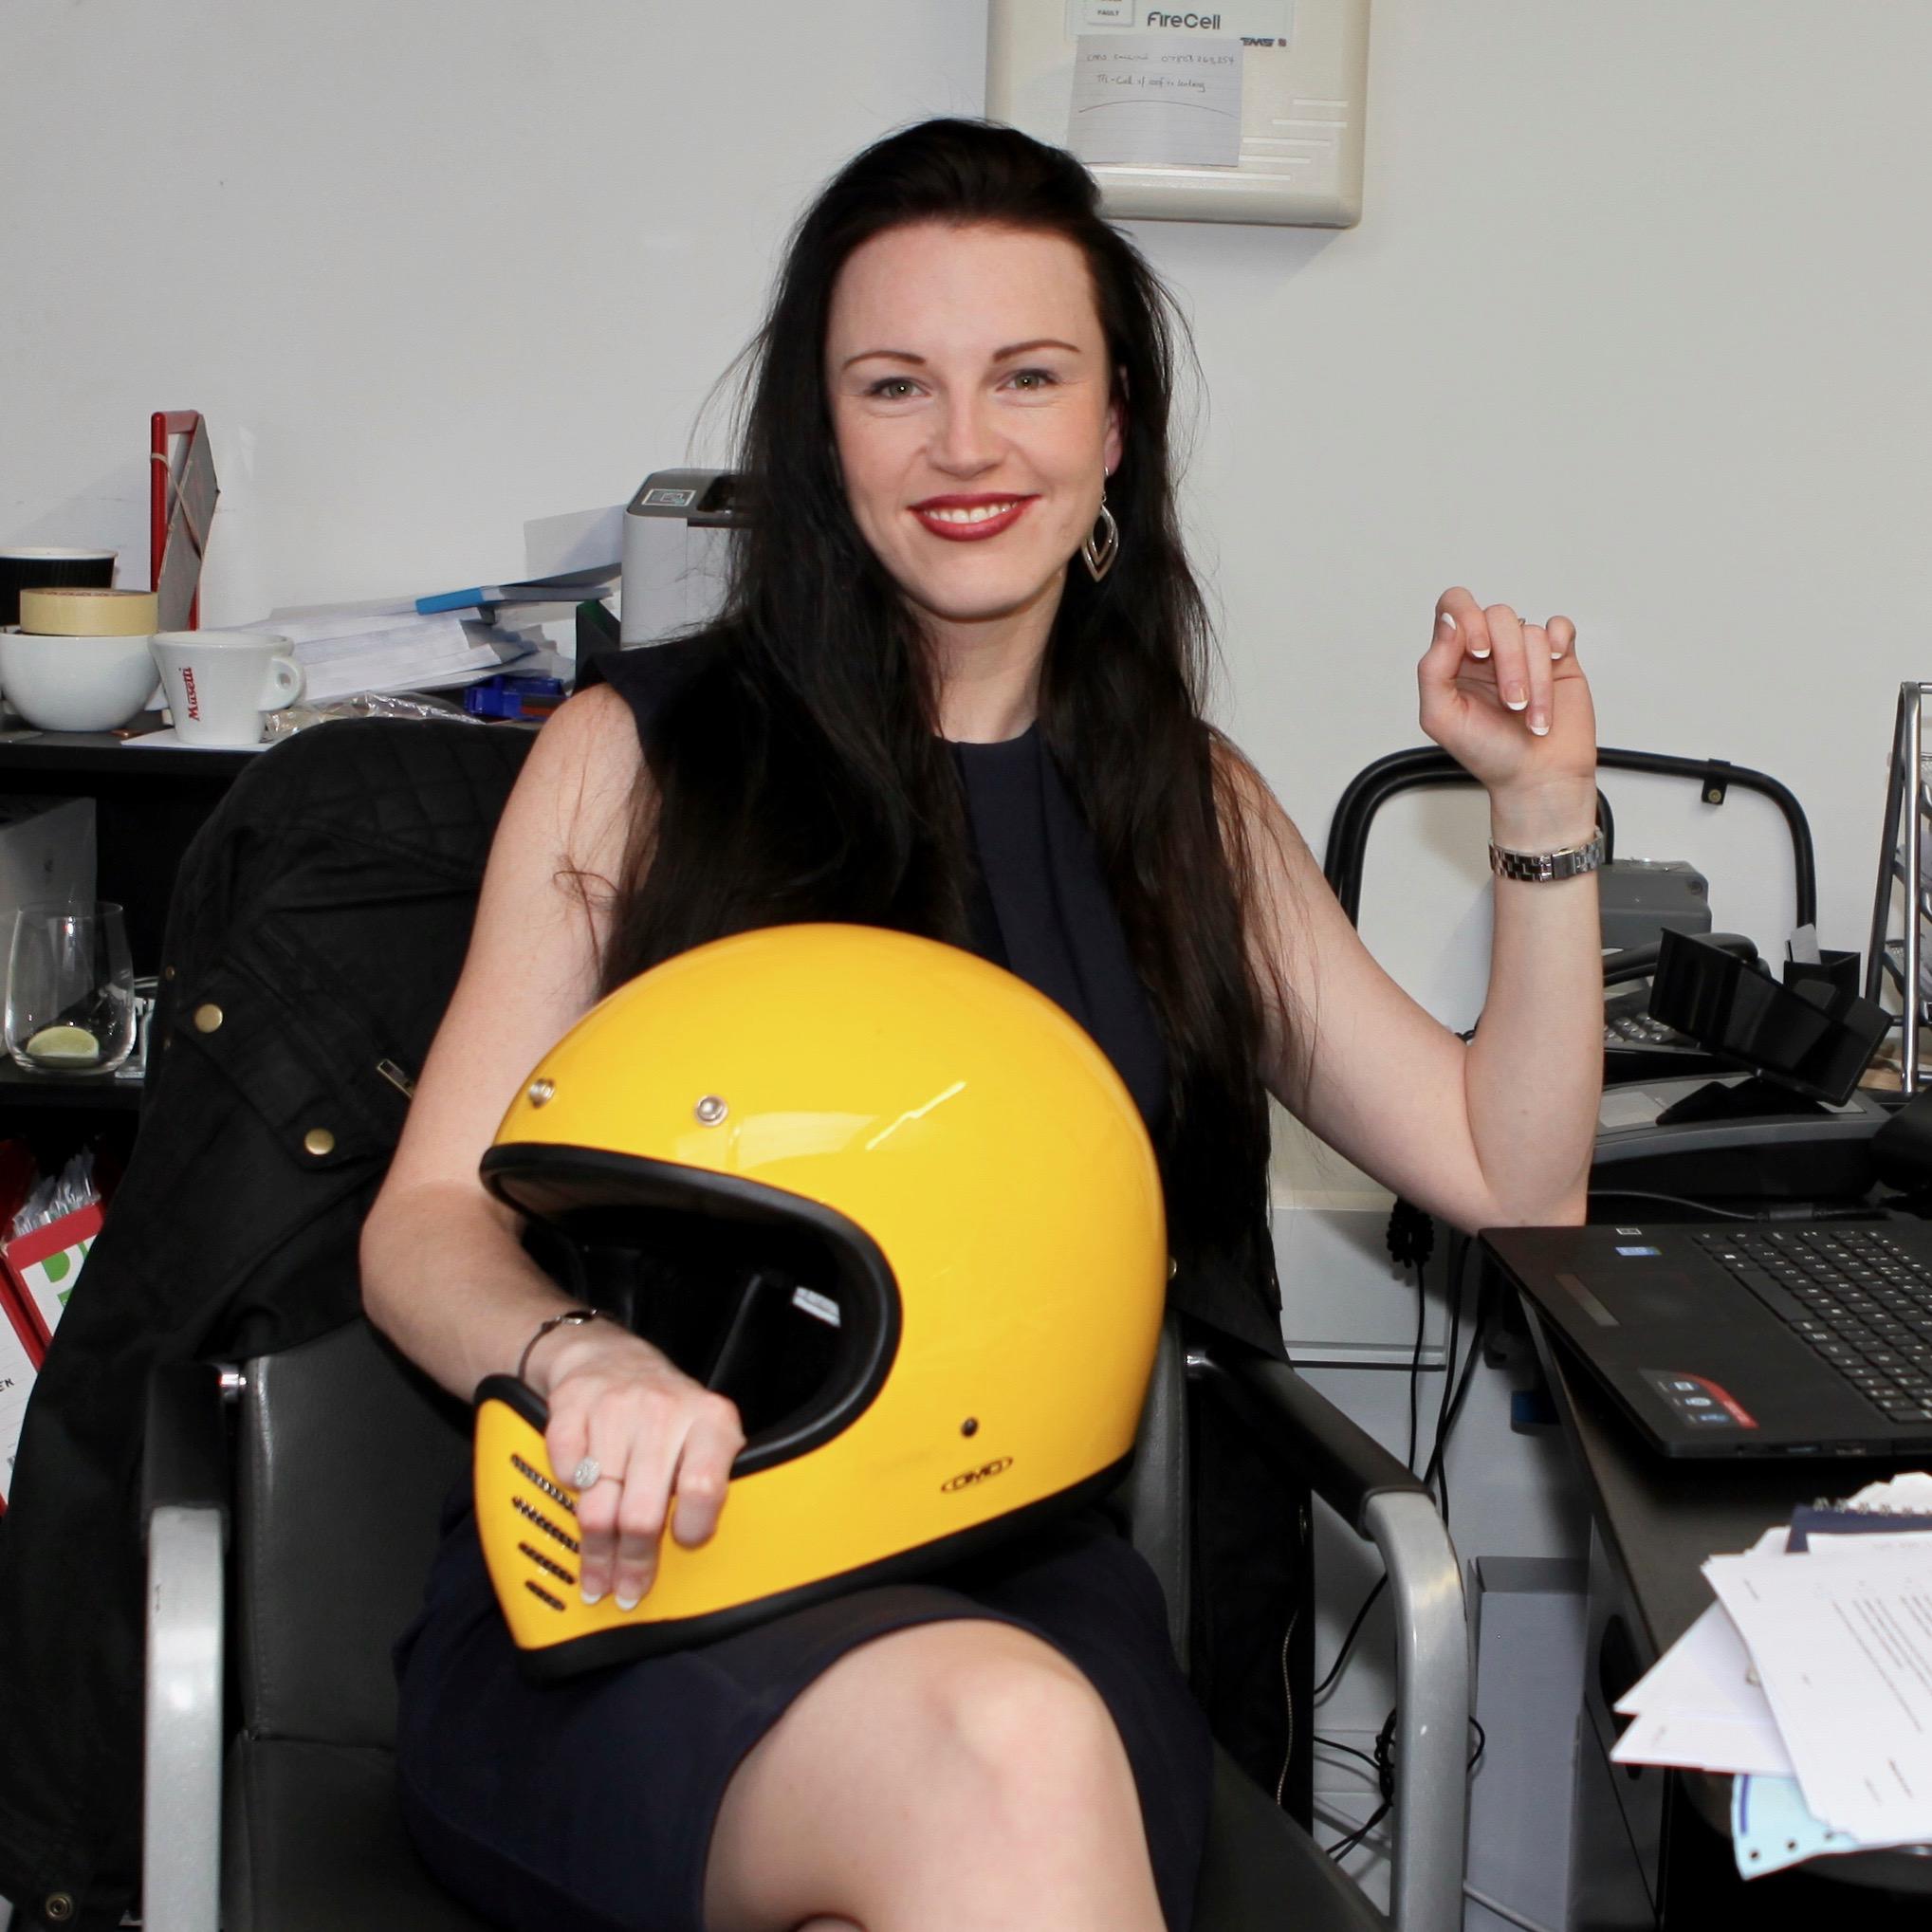 Office worker Nikita rides London #WeRideLondon http://www.weridelondon.com